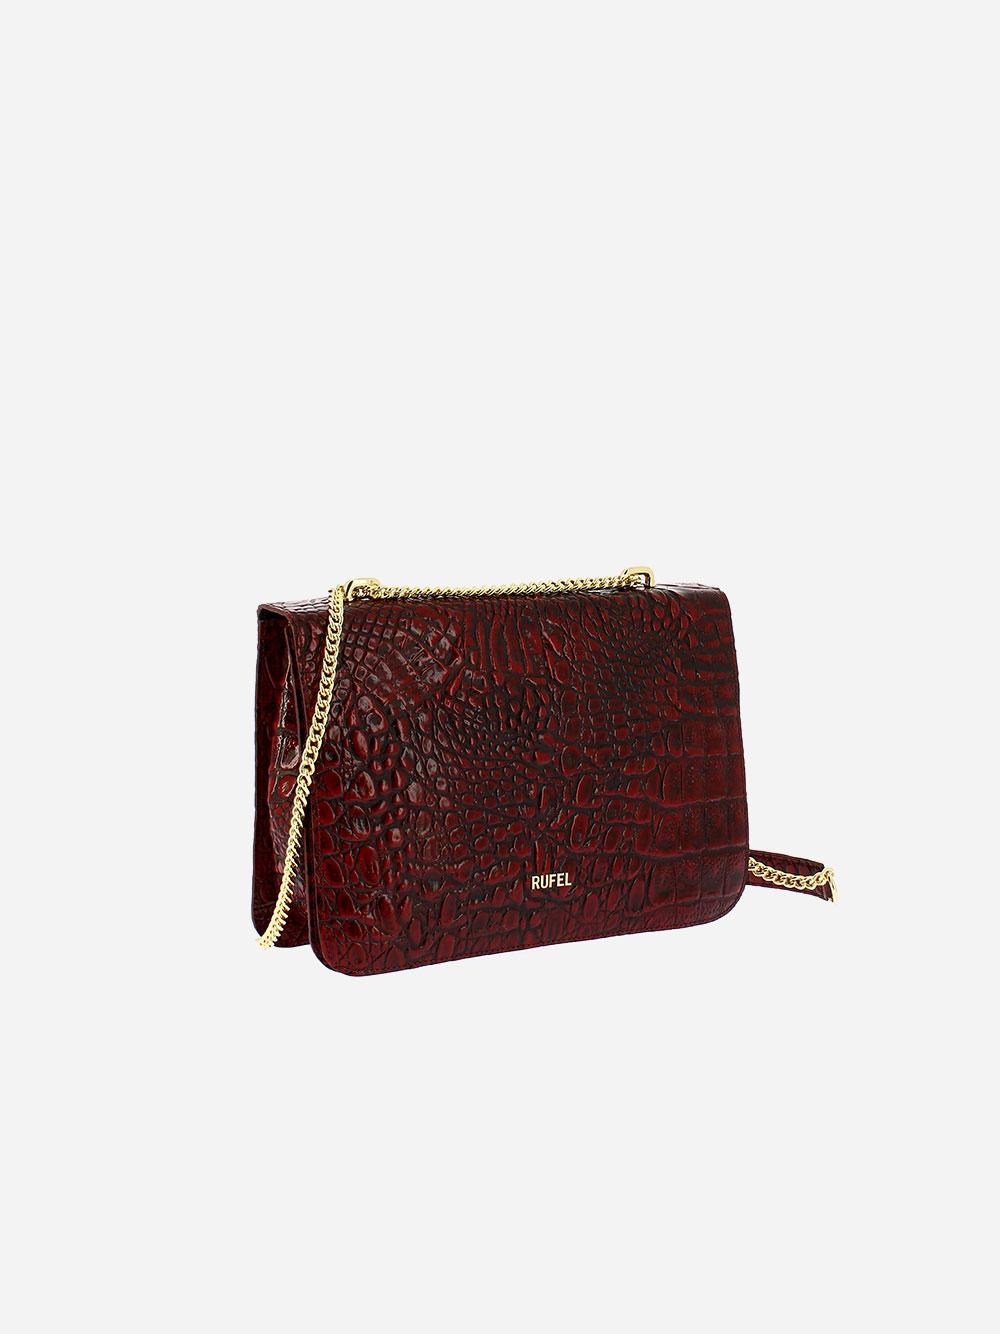 Croco Wild Burgundy Crossbody Bag